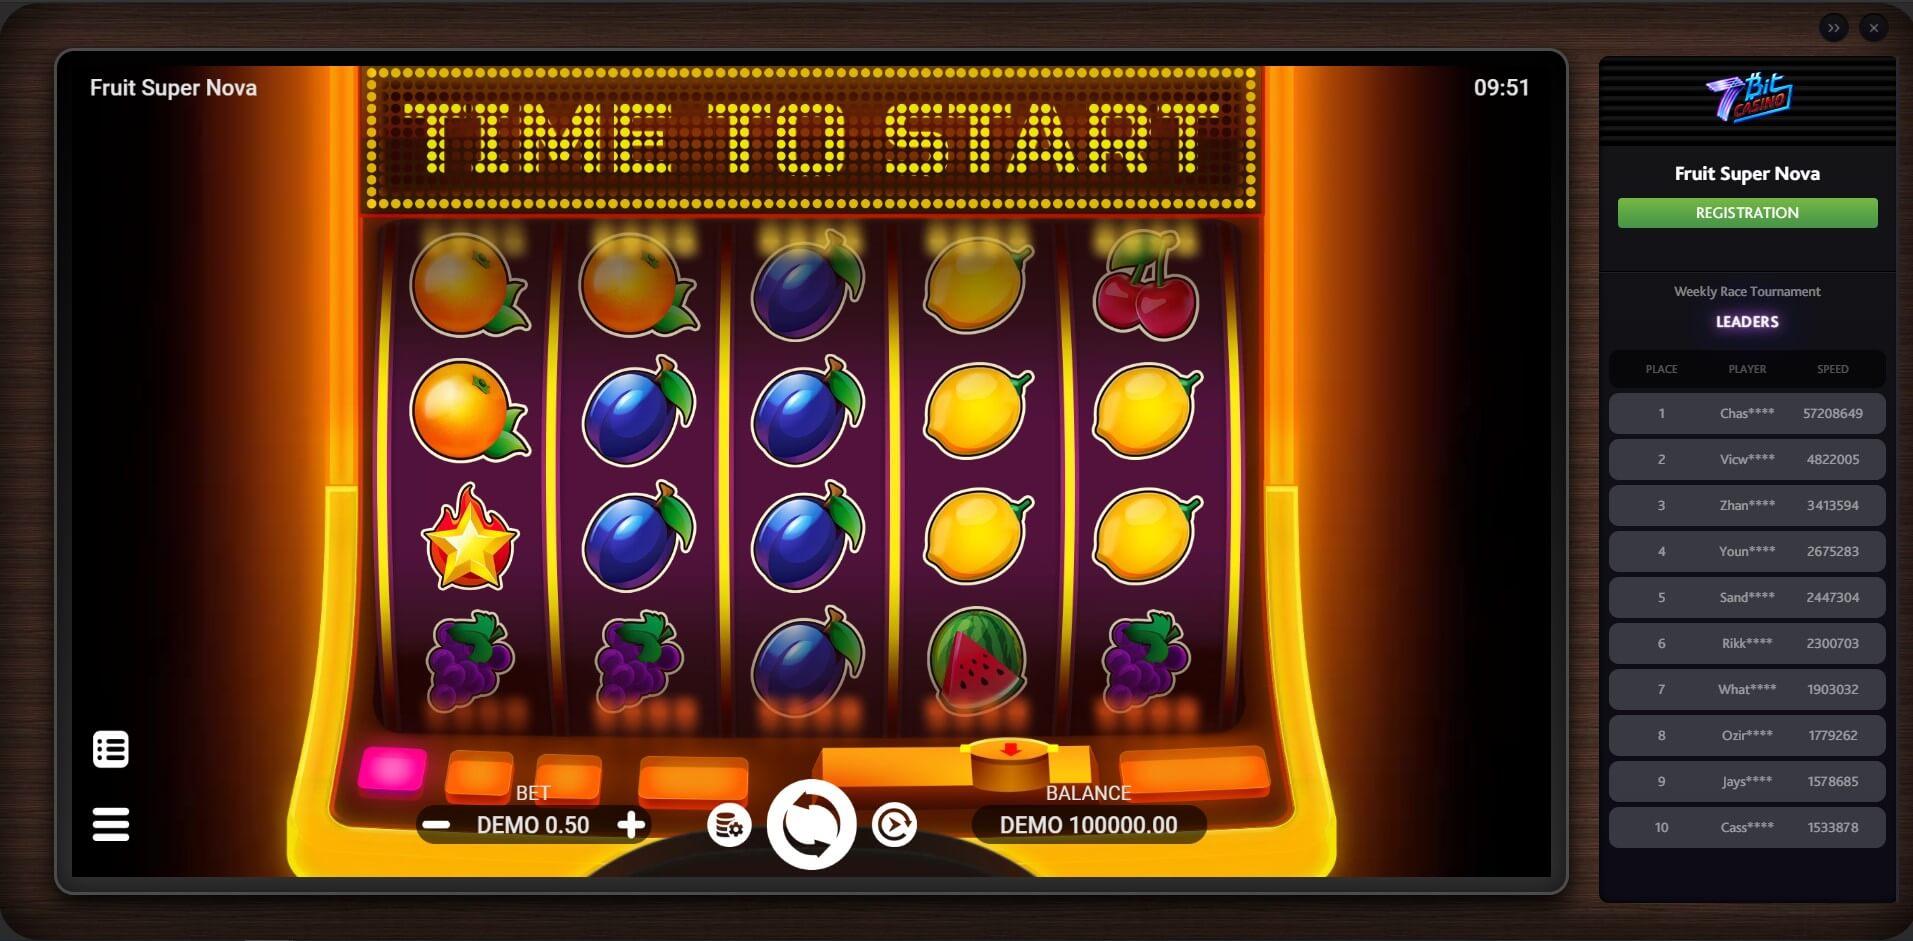 Game Play at 7Bit Casino